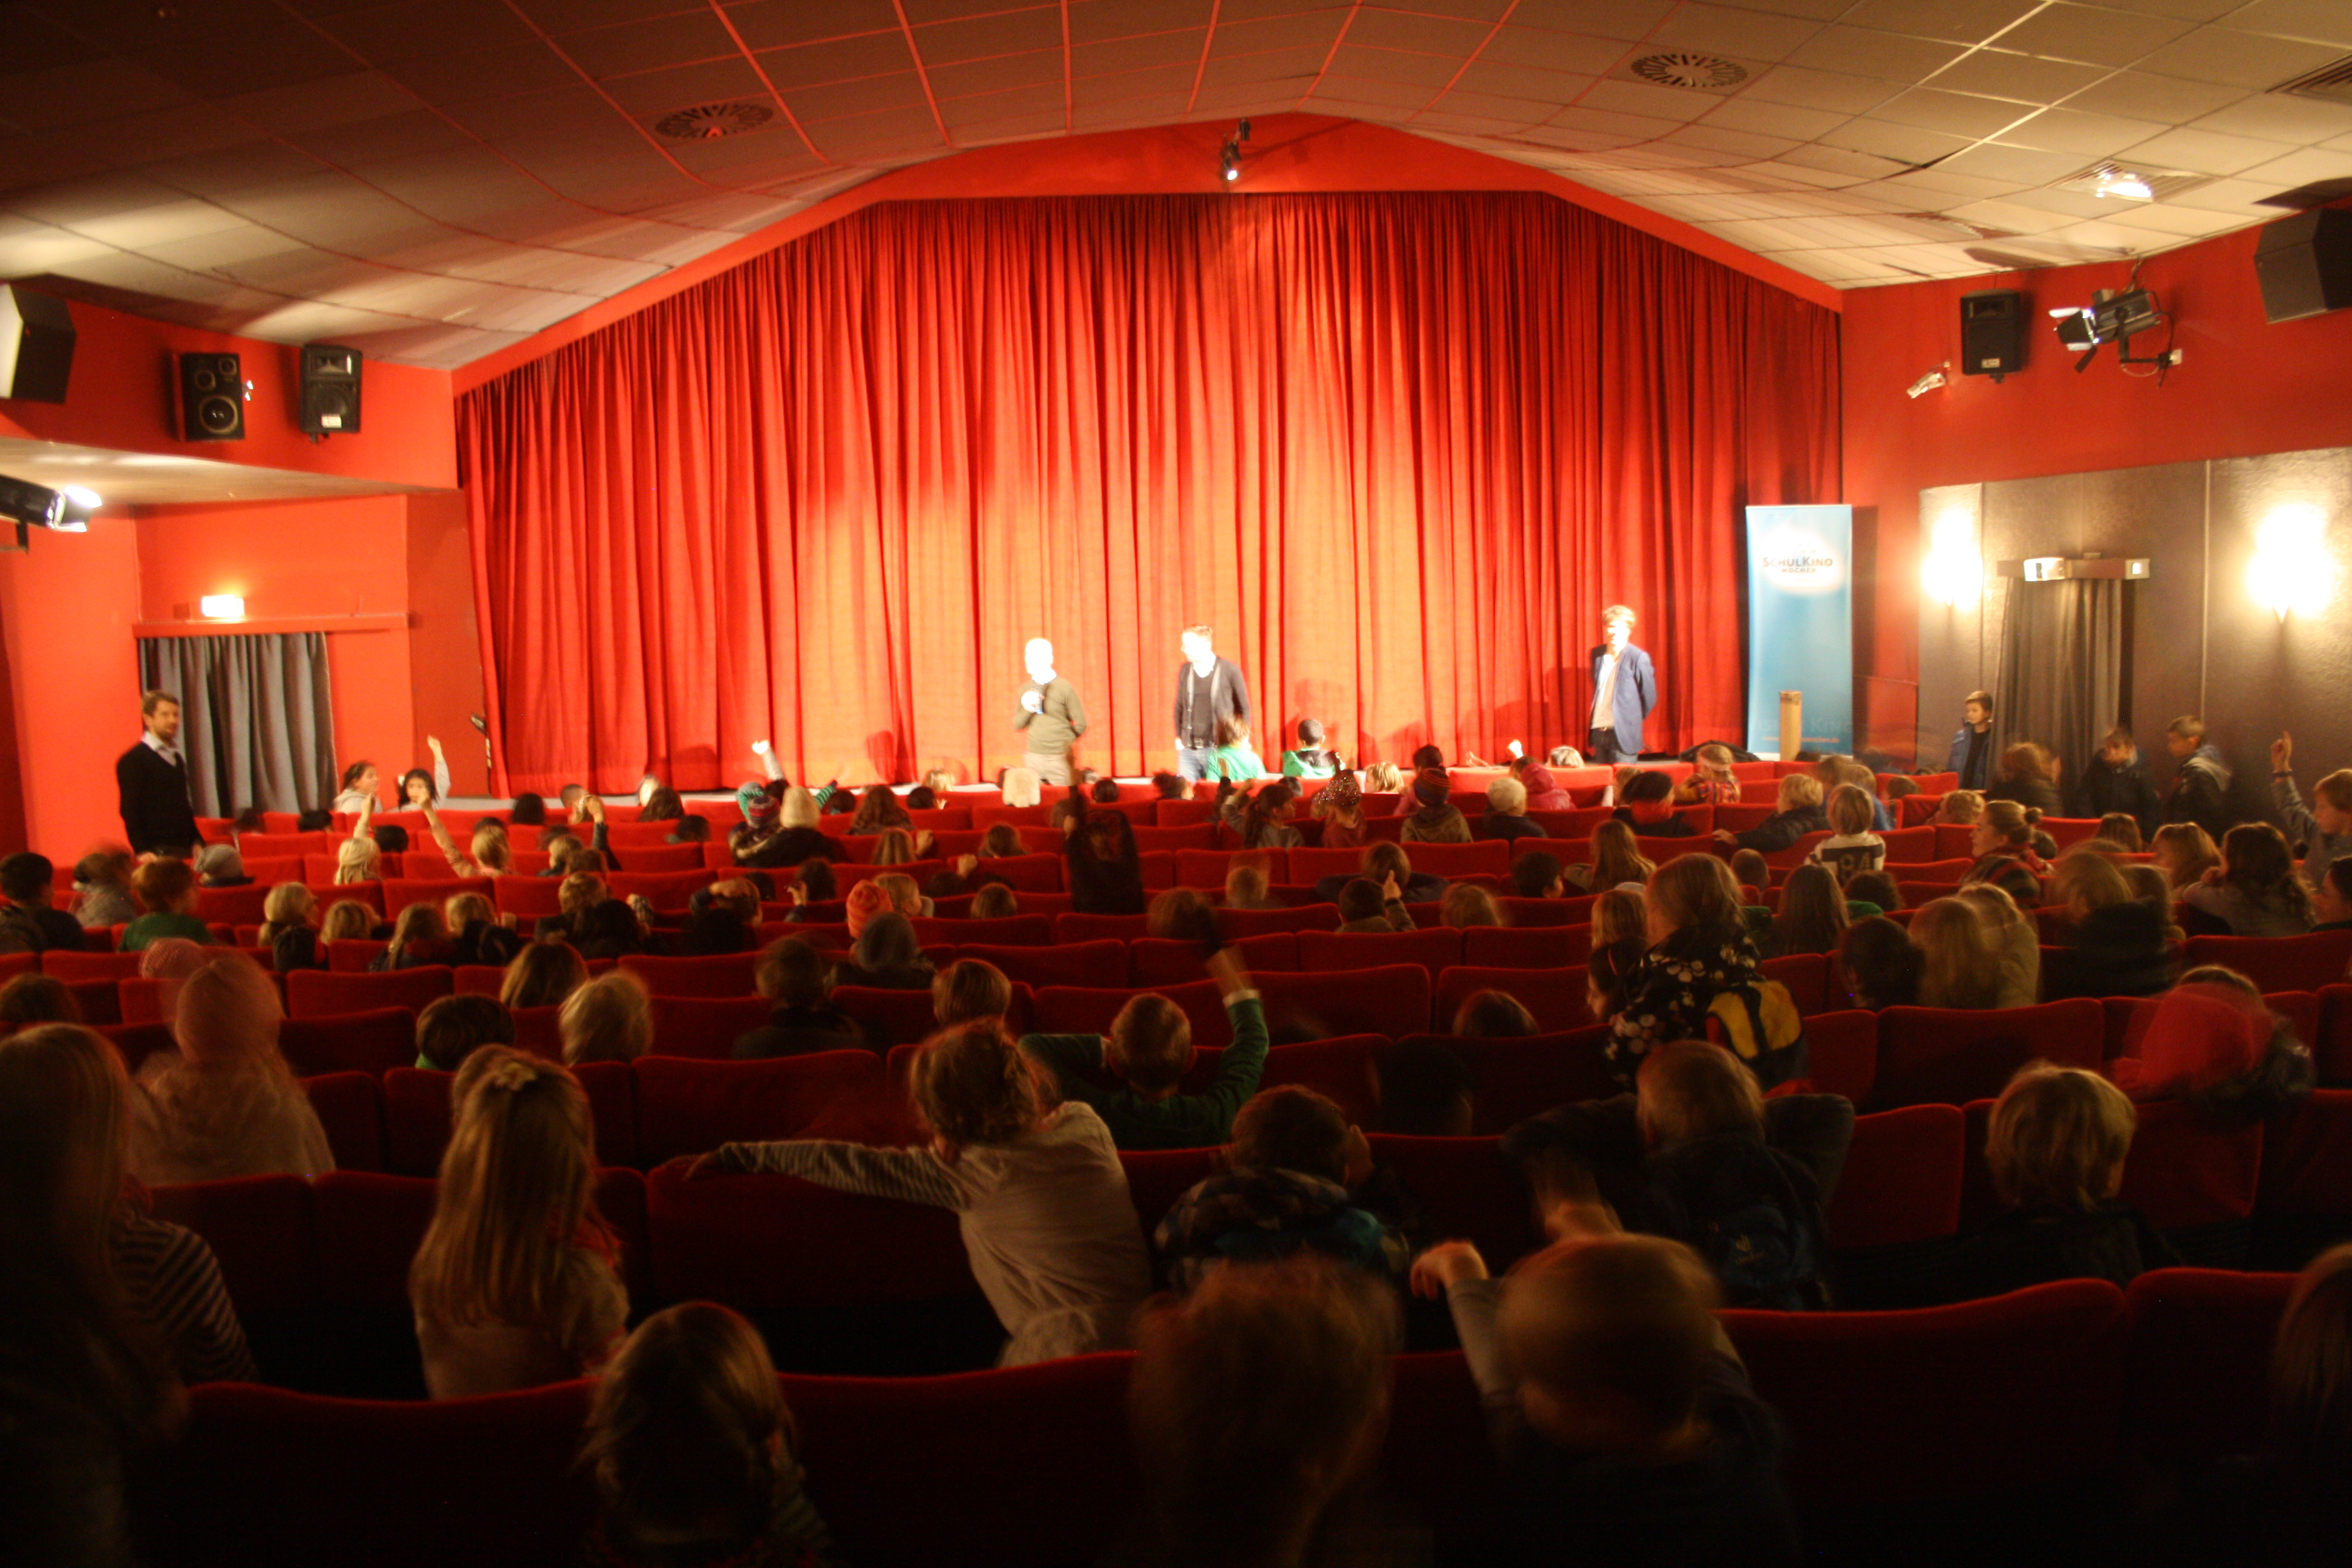 Abaton Kino Hamburg Programm Heute